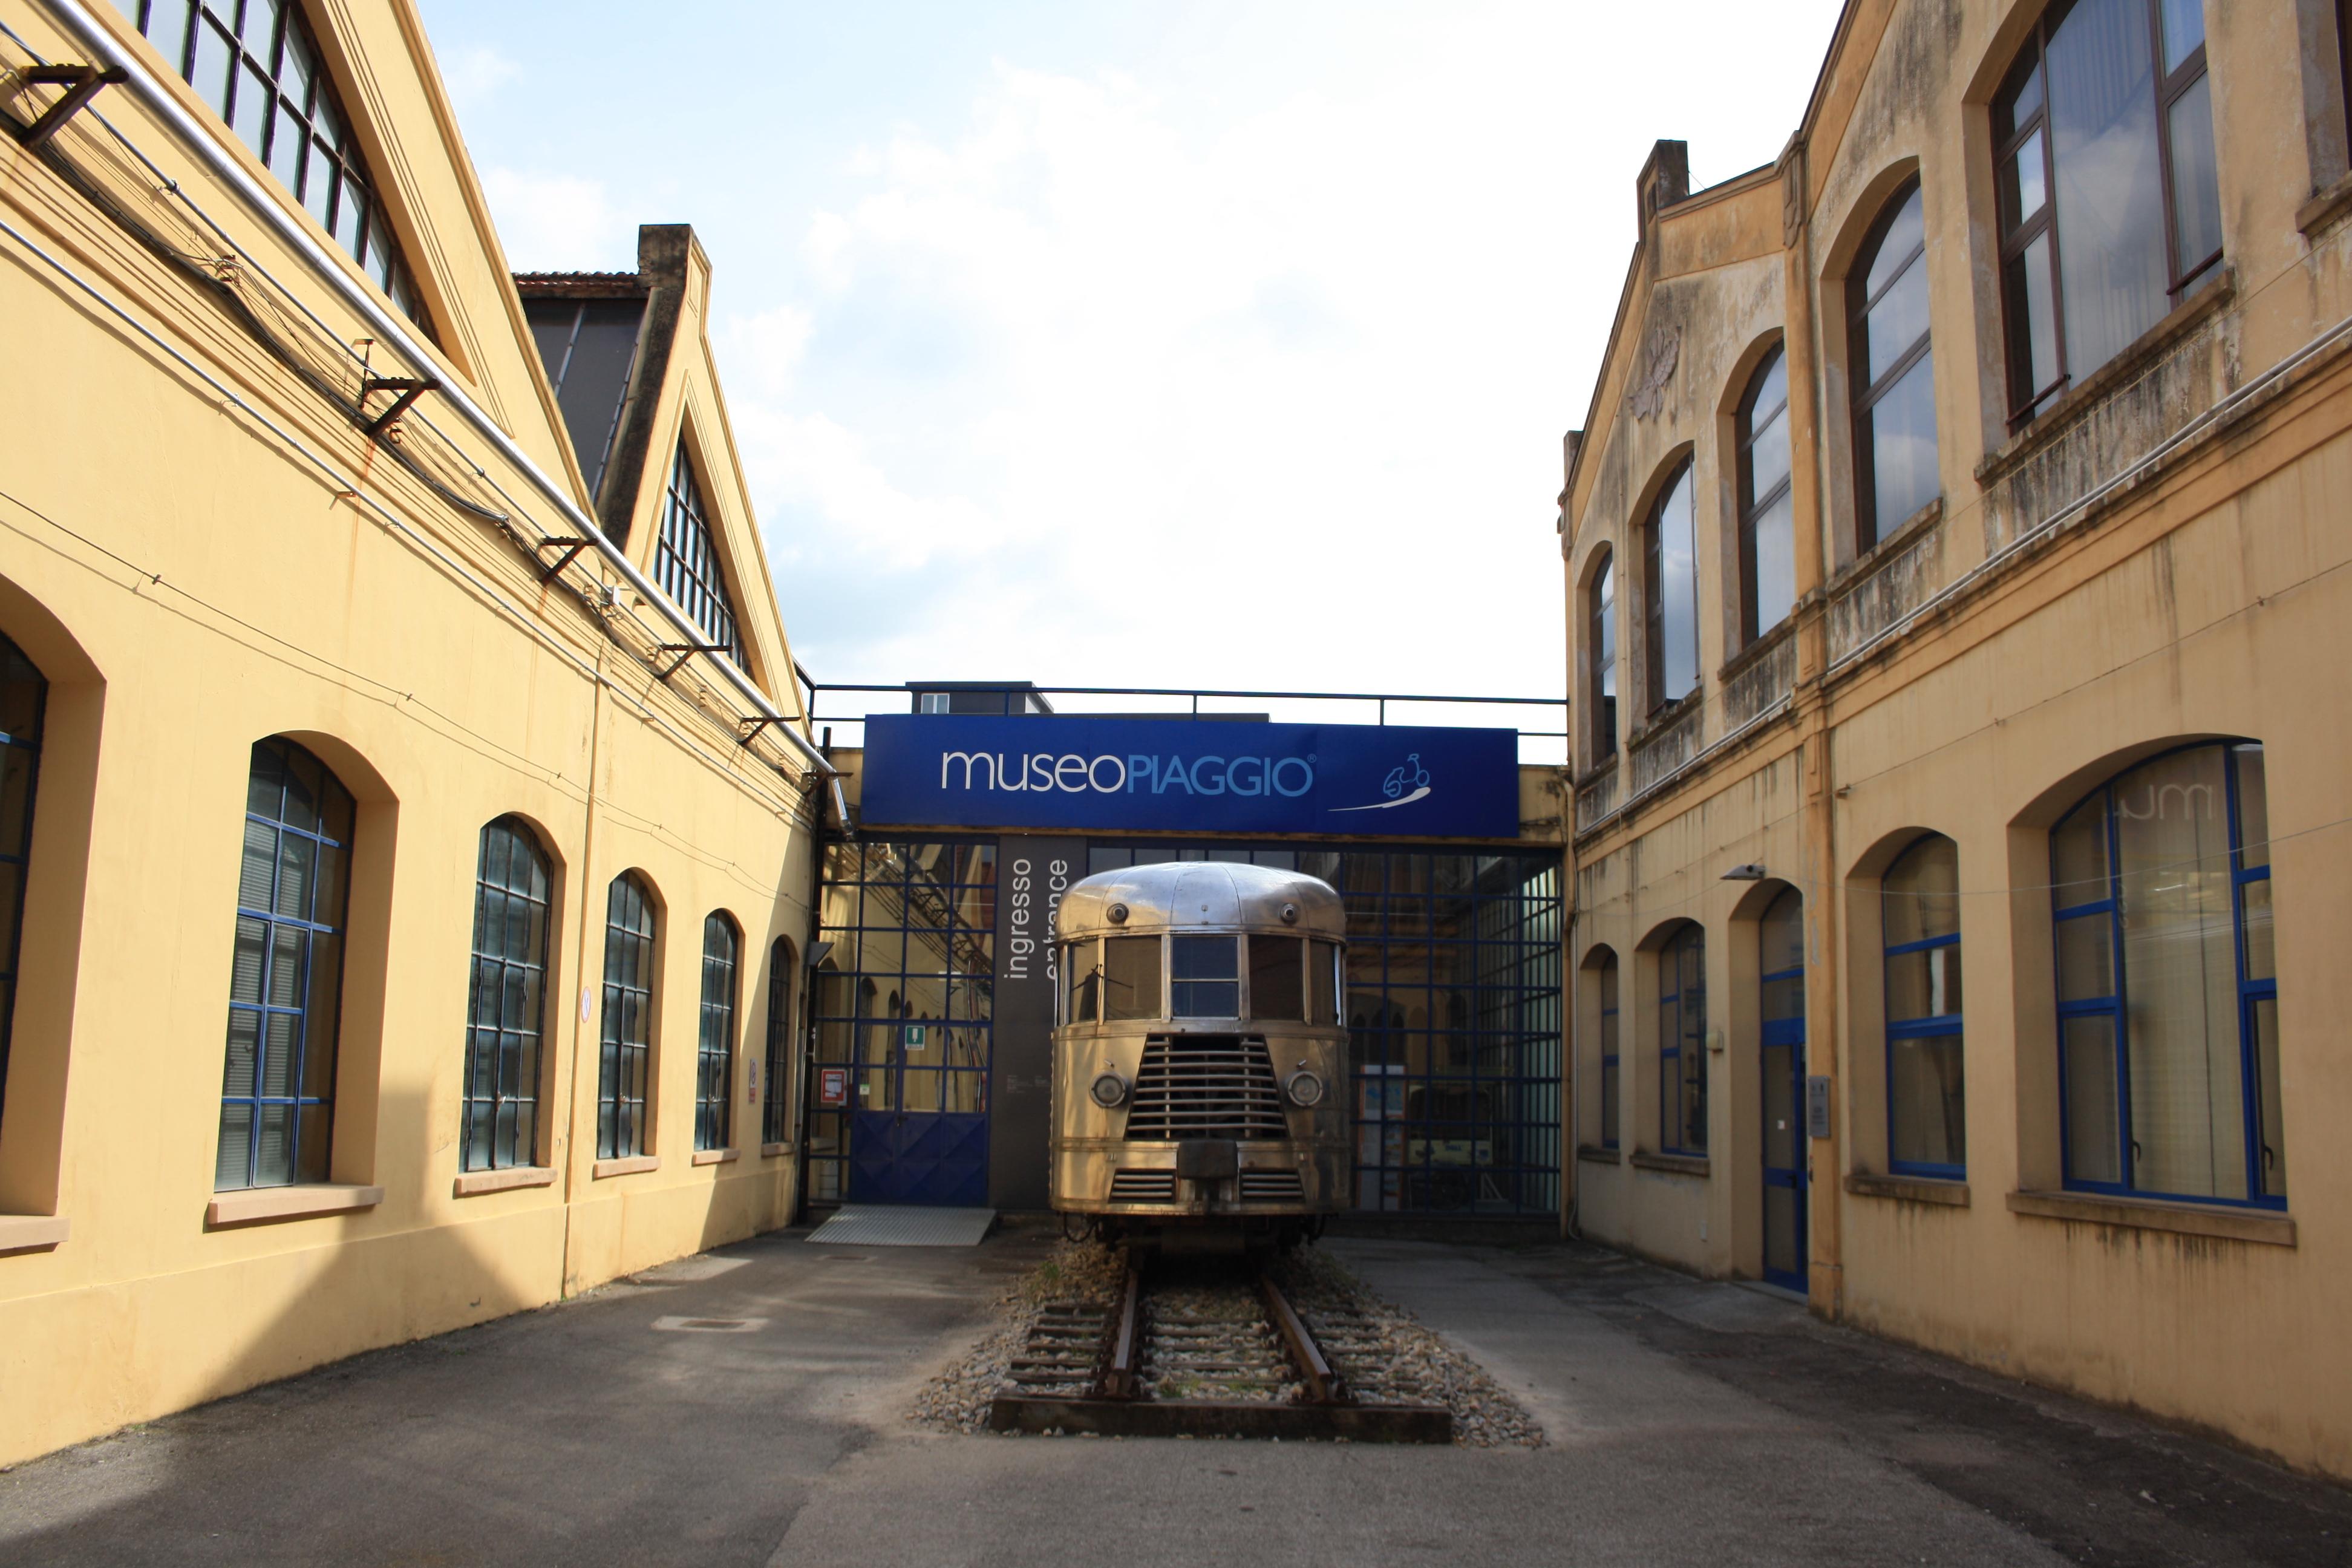 La locomotiva del 1926, Museo Piaggio